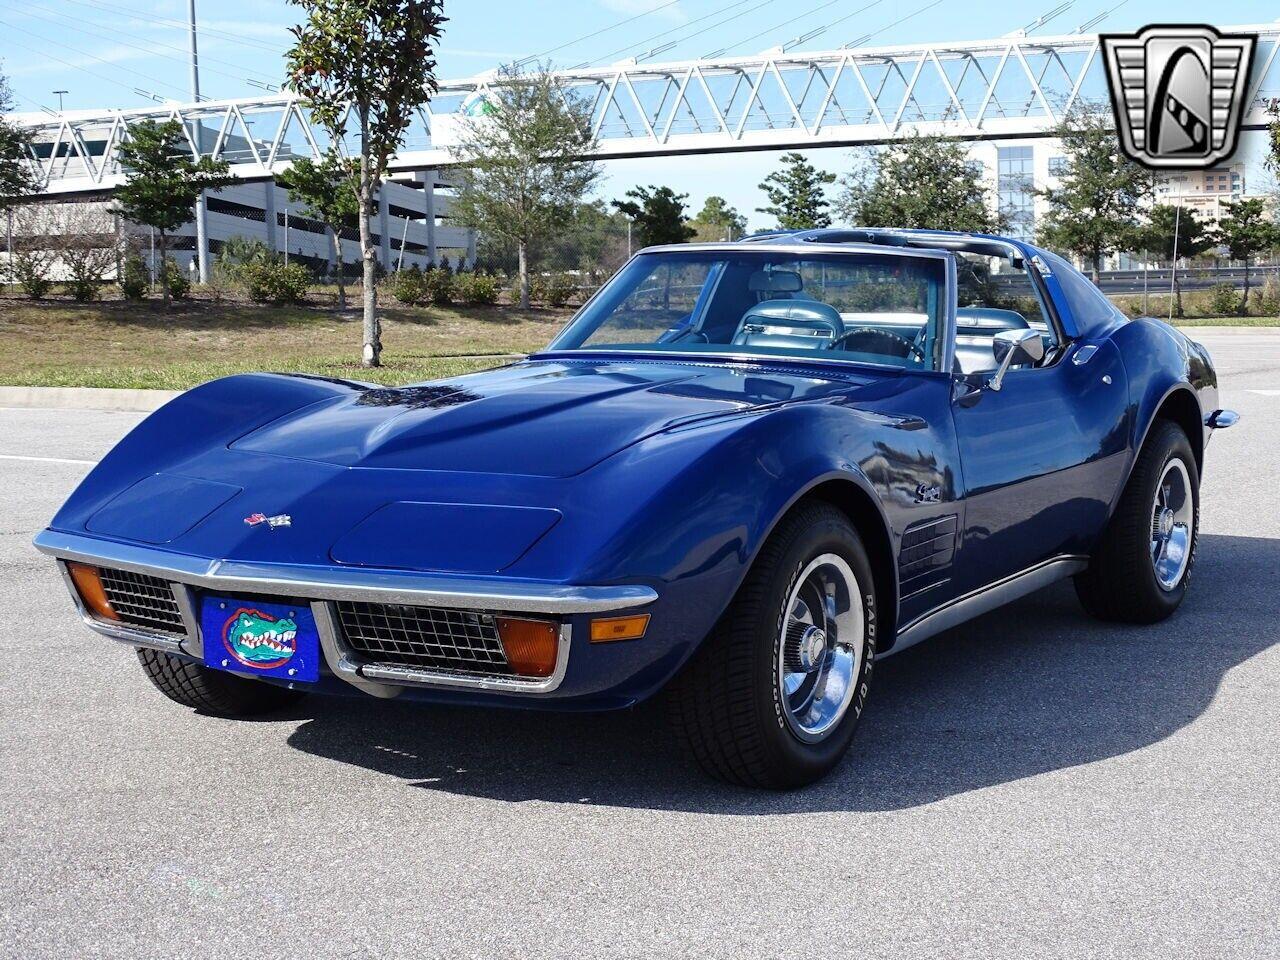 1972 Blue Chevrolet Corvette Stingray  | C3 Corvette Photo 5